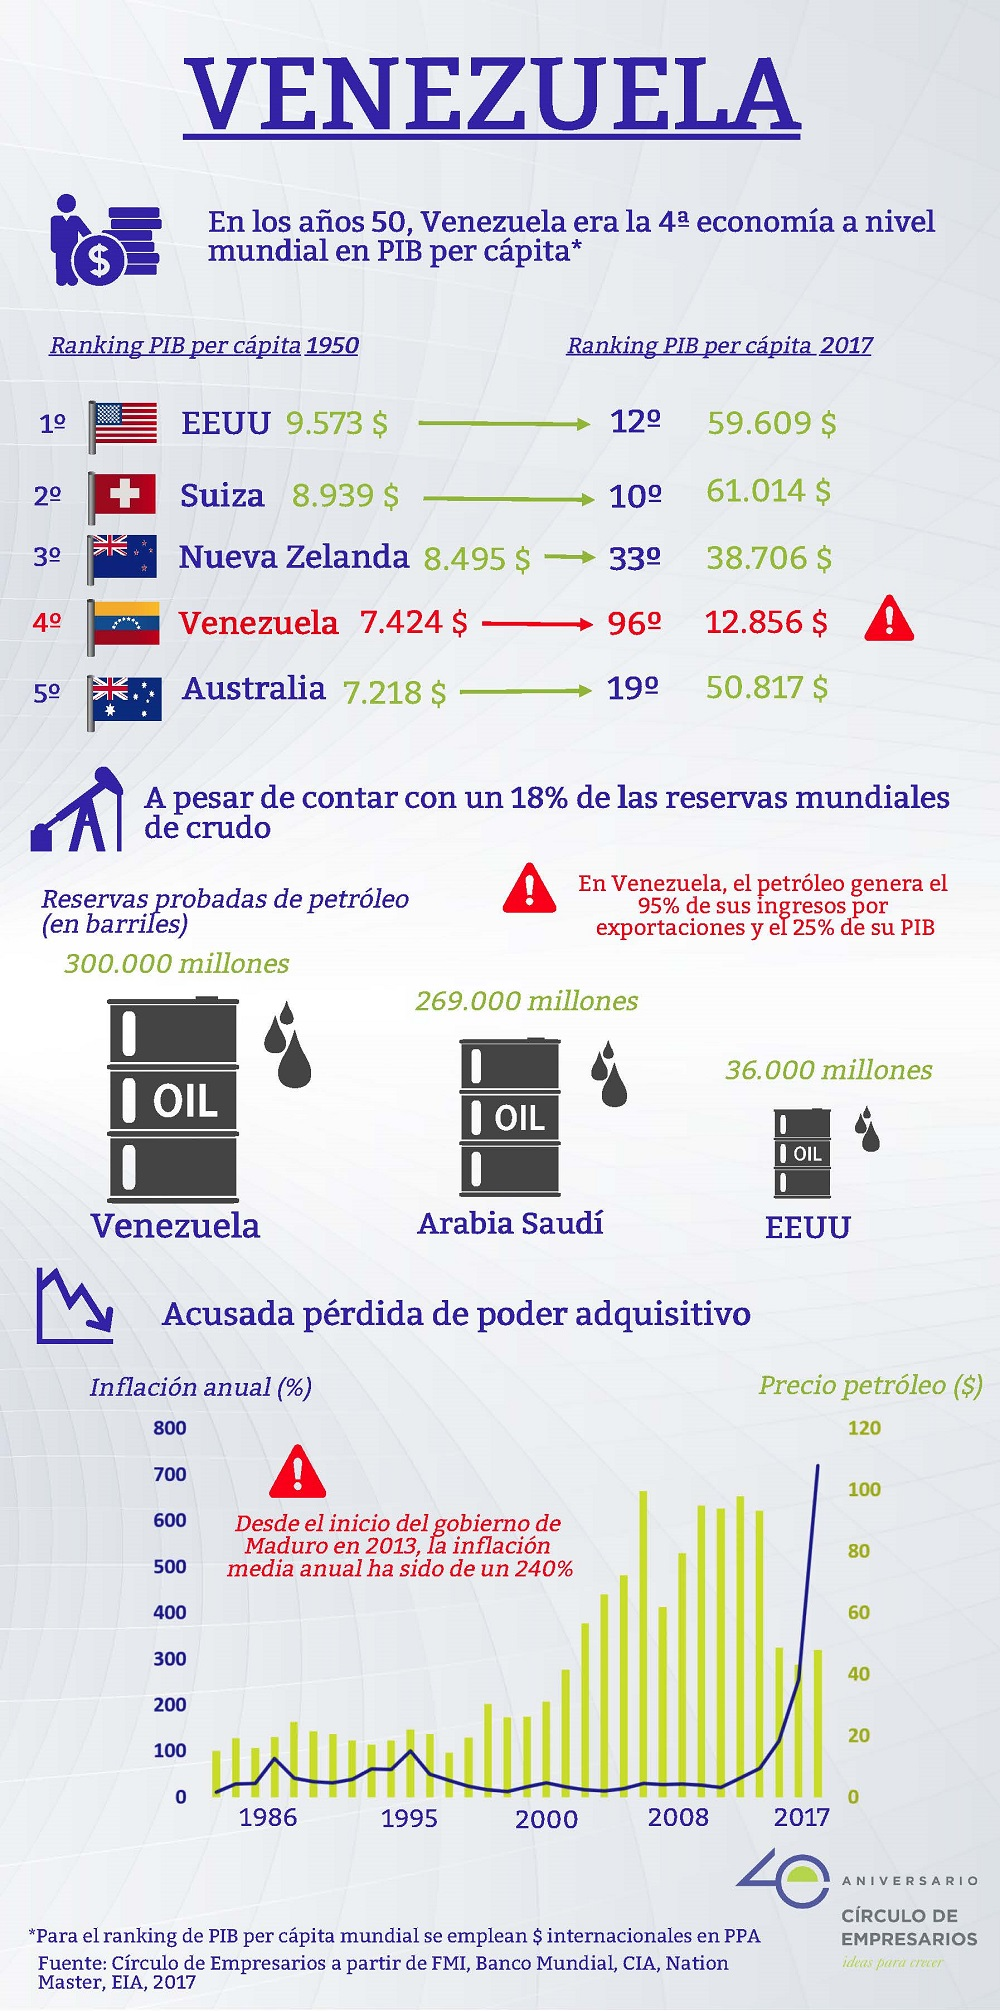 Infografía sobre la evolución histórica de Venezuela